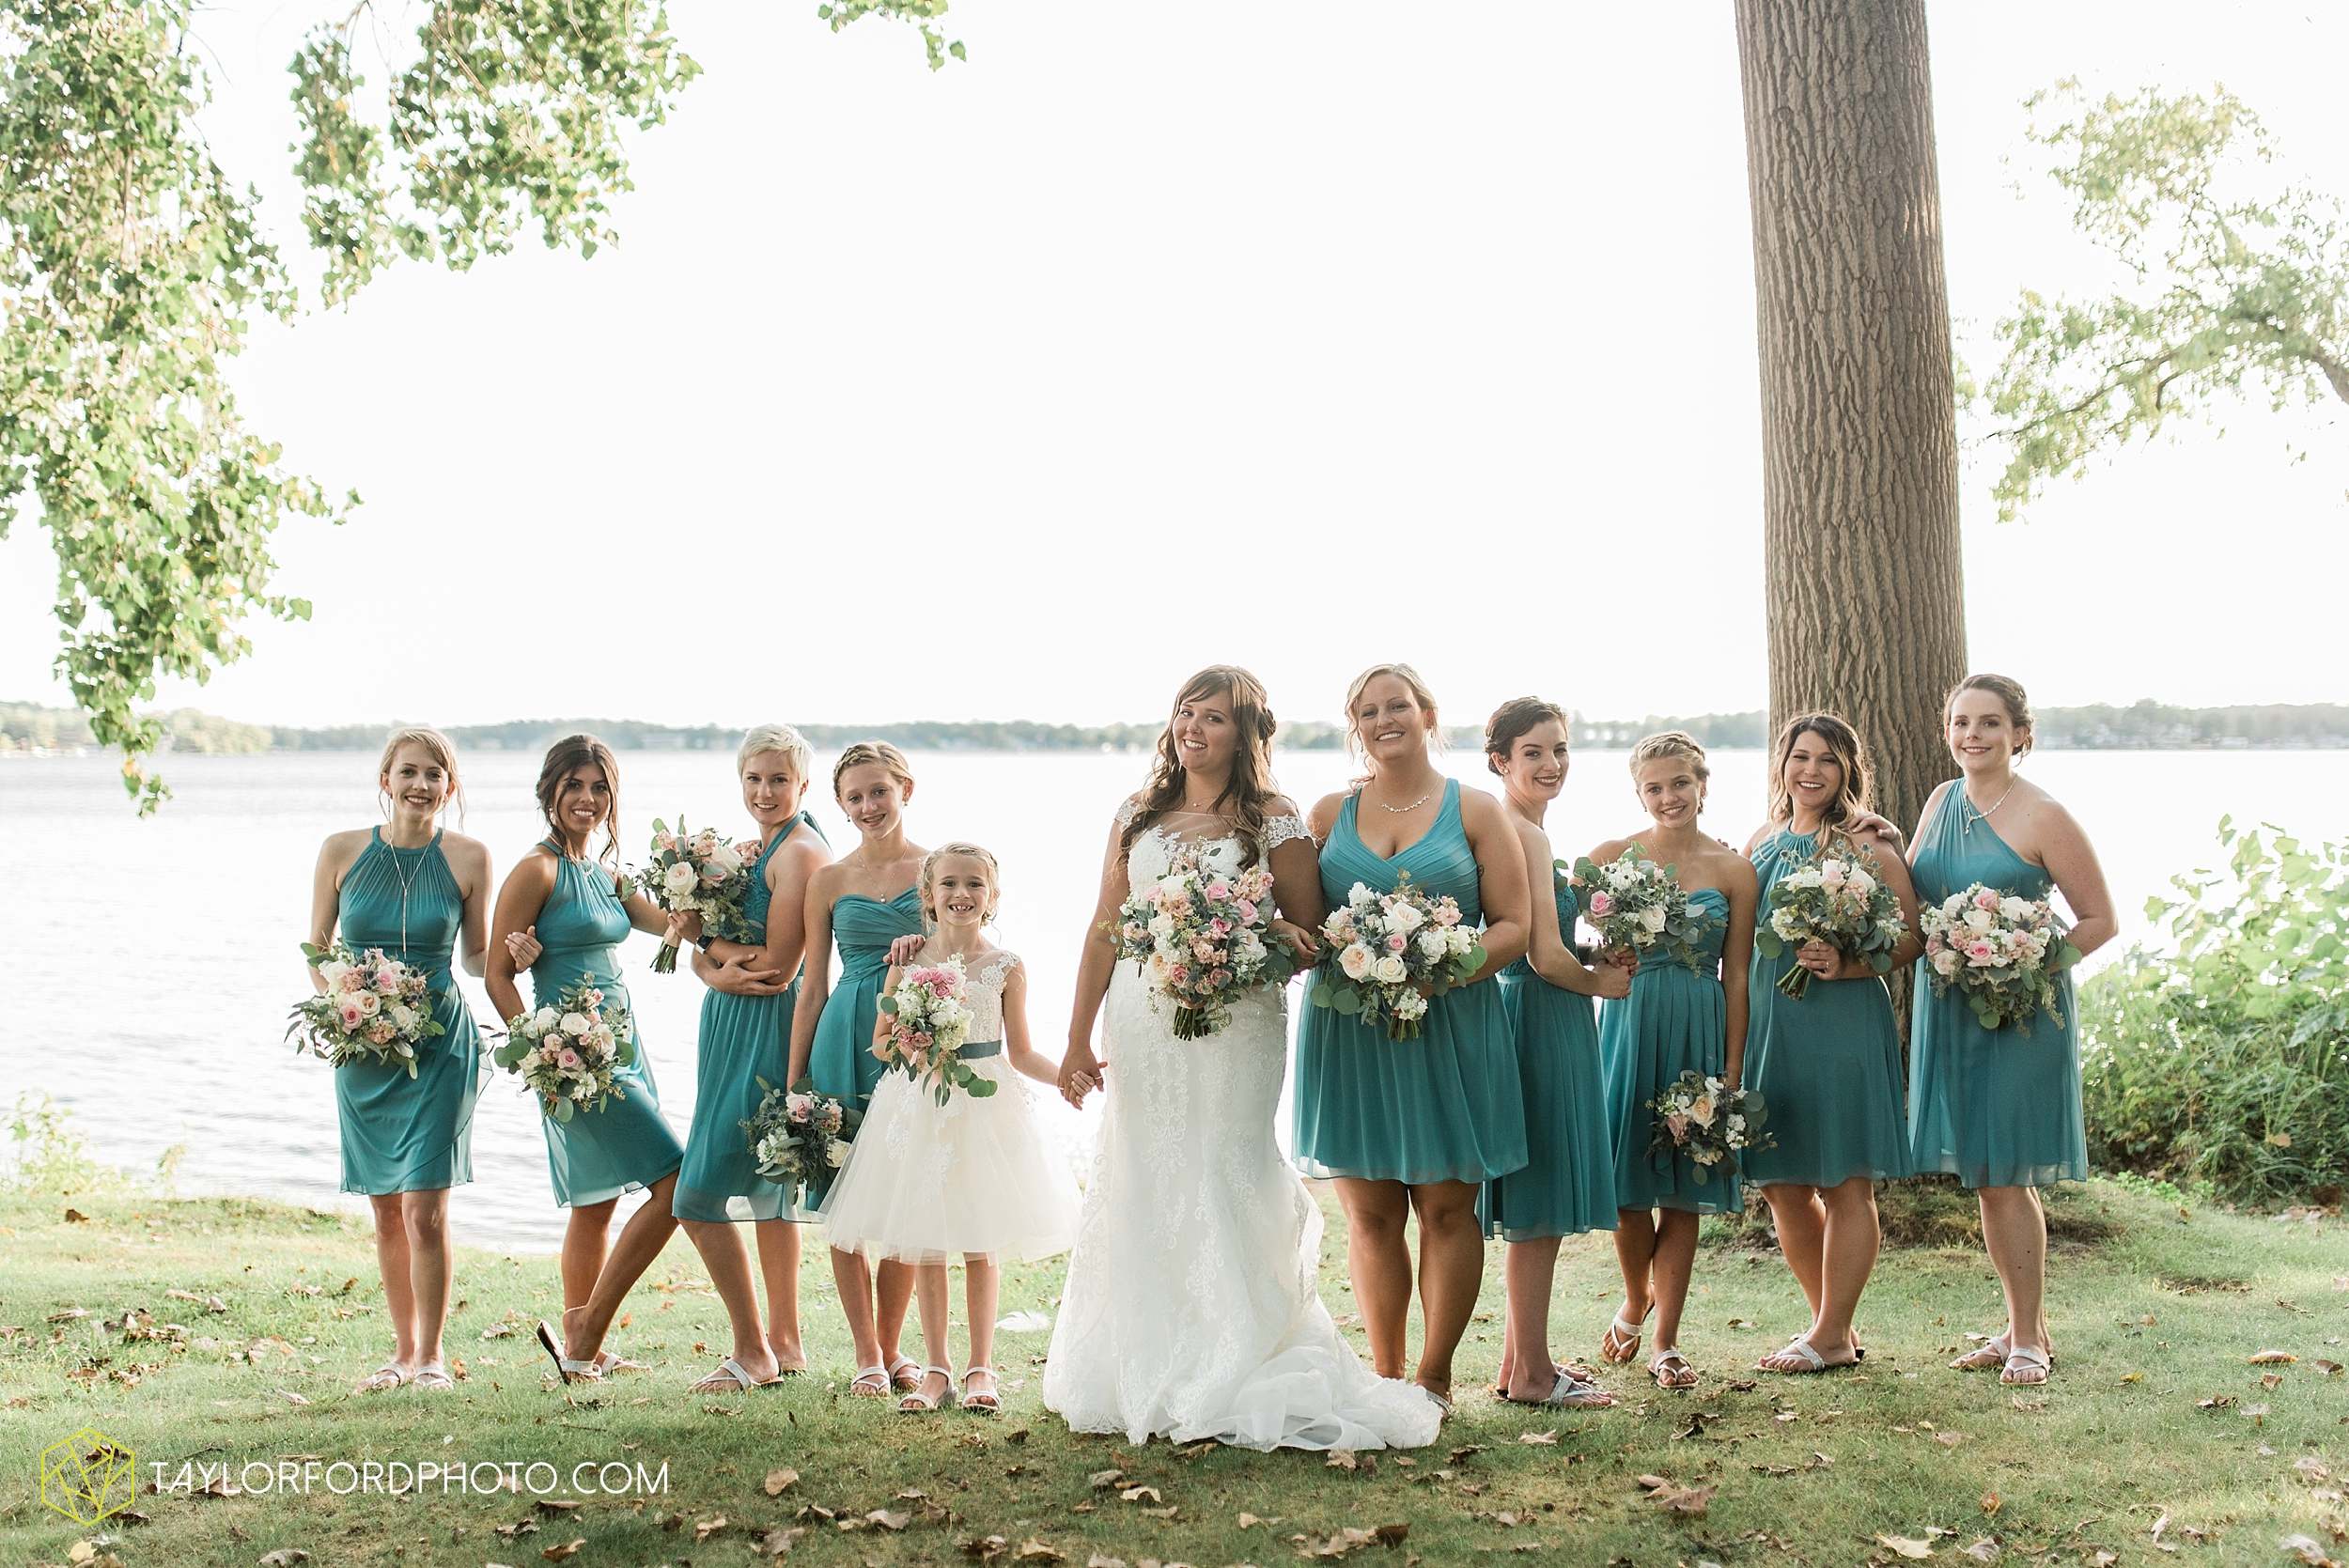 brook-loren-pokagon-state-park-angola-indiana-potowatomi-inn-wedding-fall-lake-james-photographer-taylor-ford-photography_0536.jpg